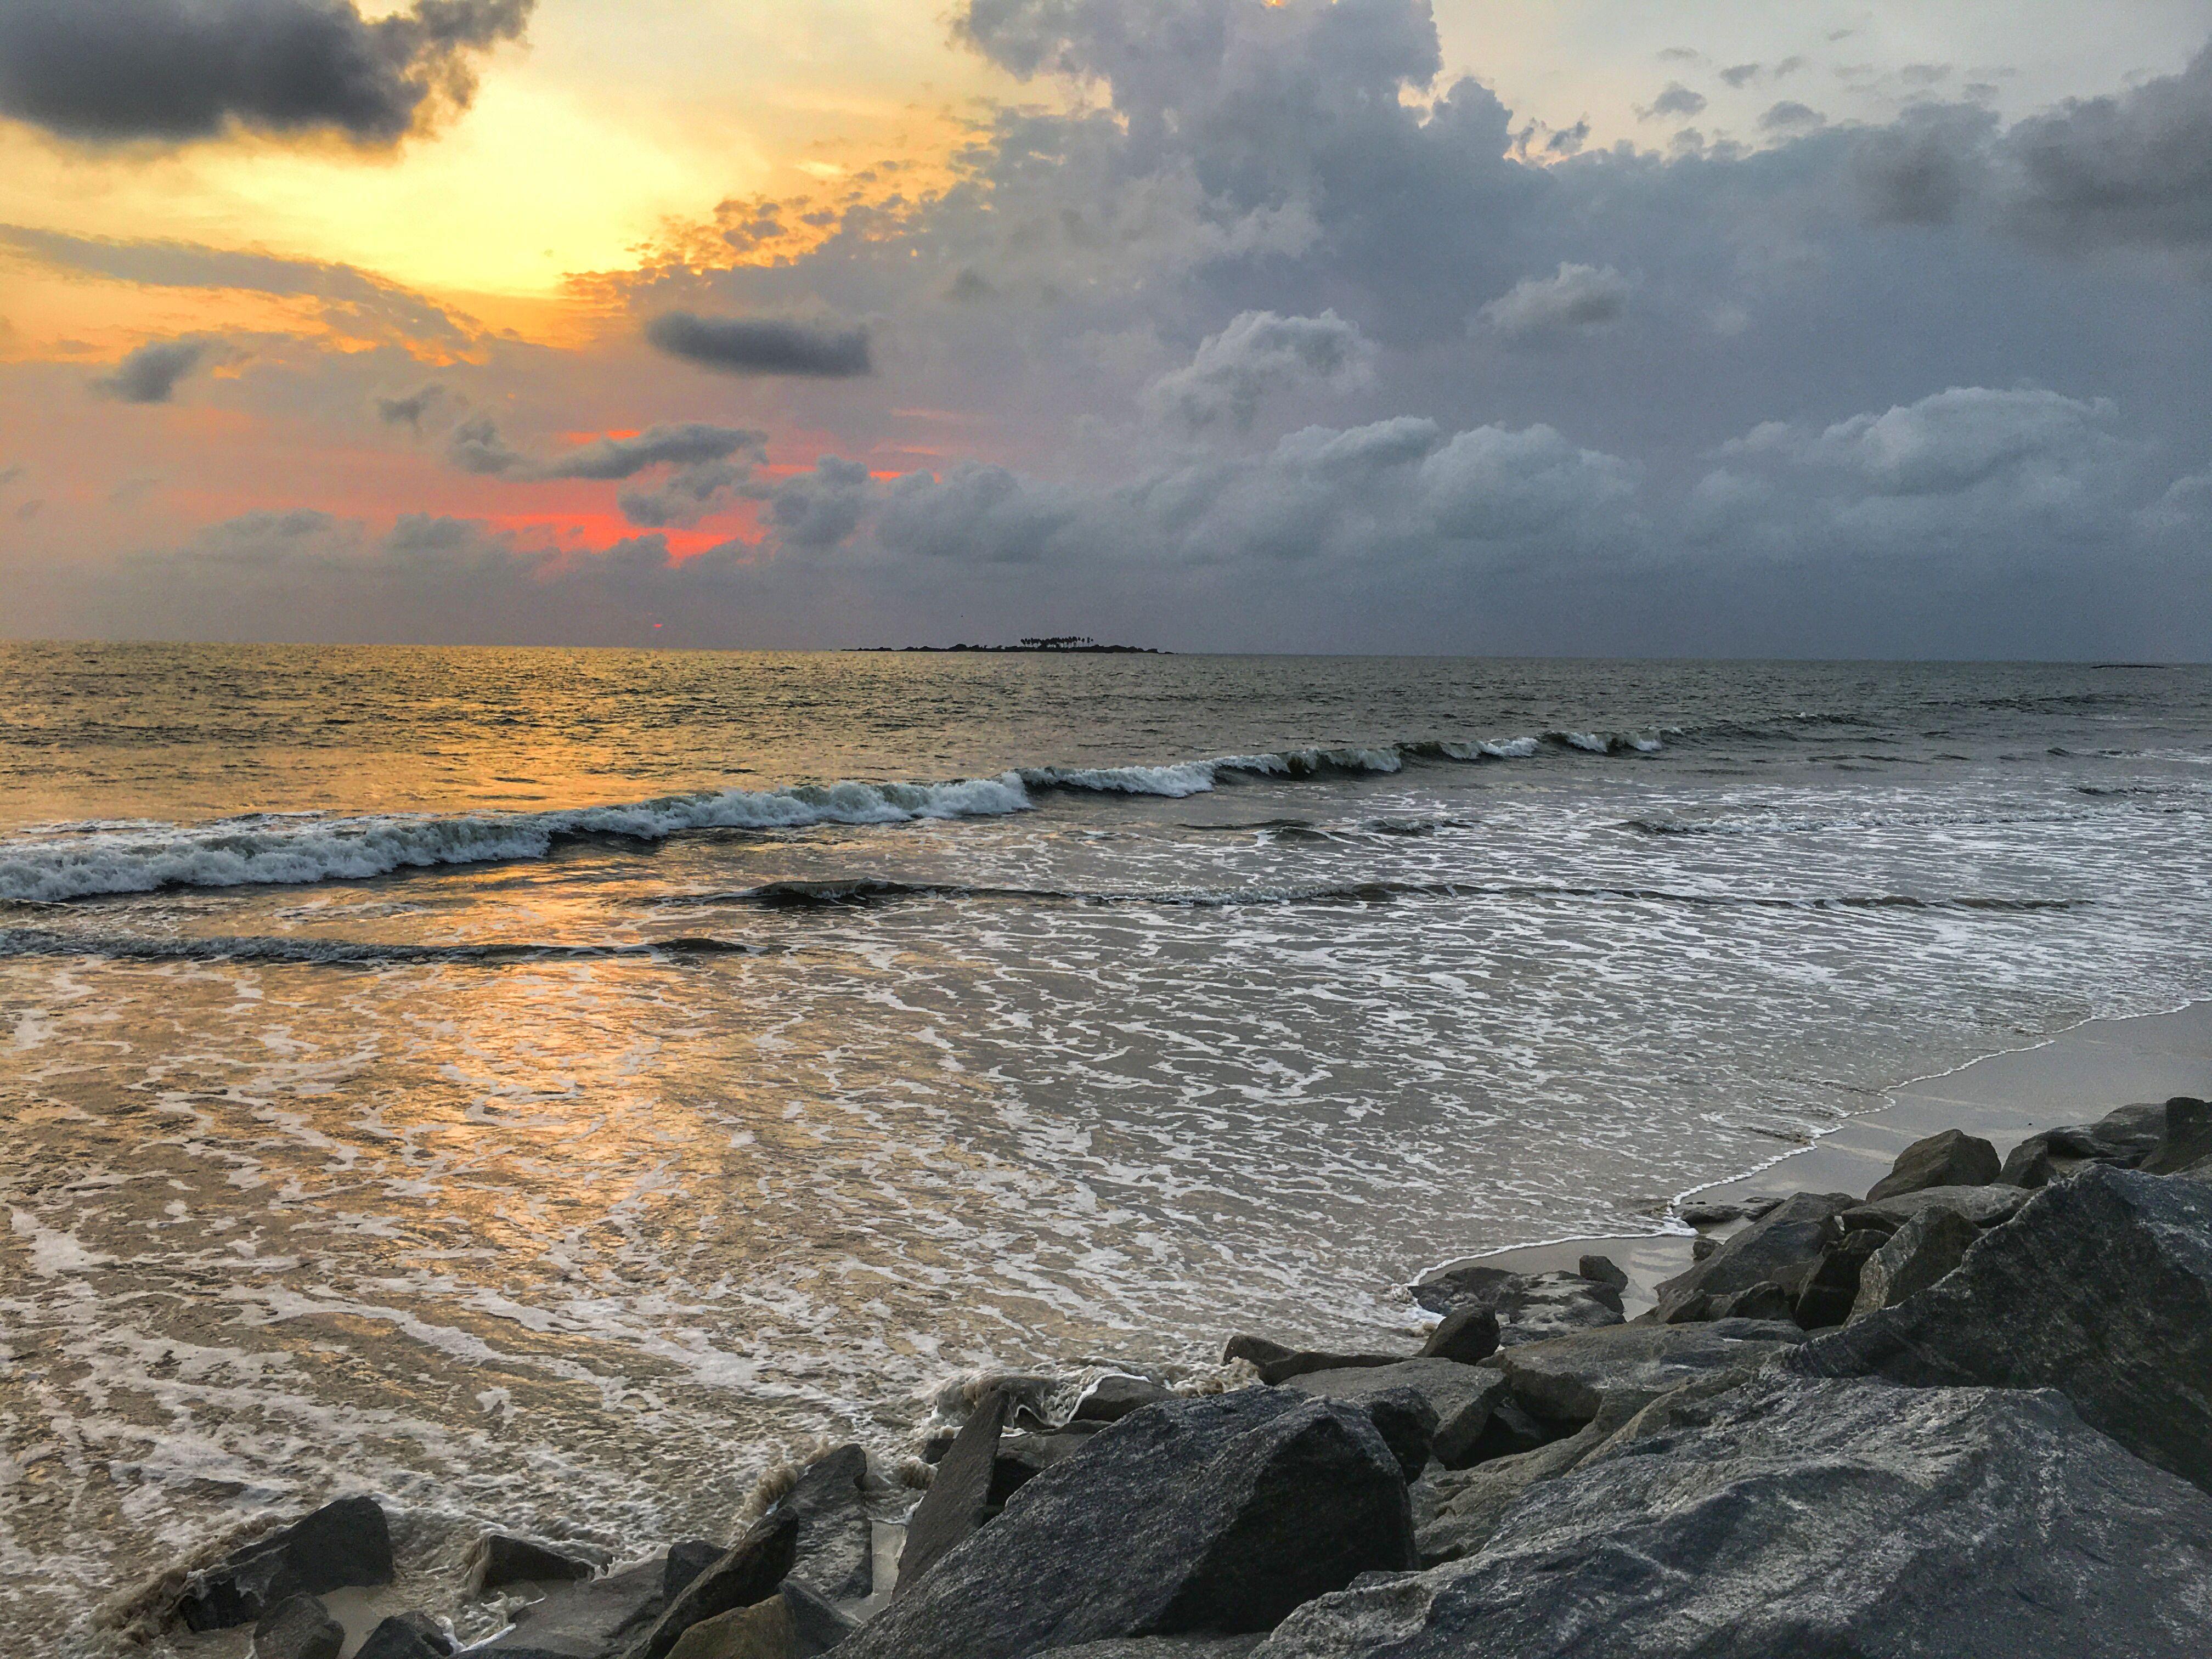 #beach #beachlife #beachhousedecor #sunset  #water #seashells